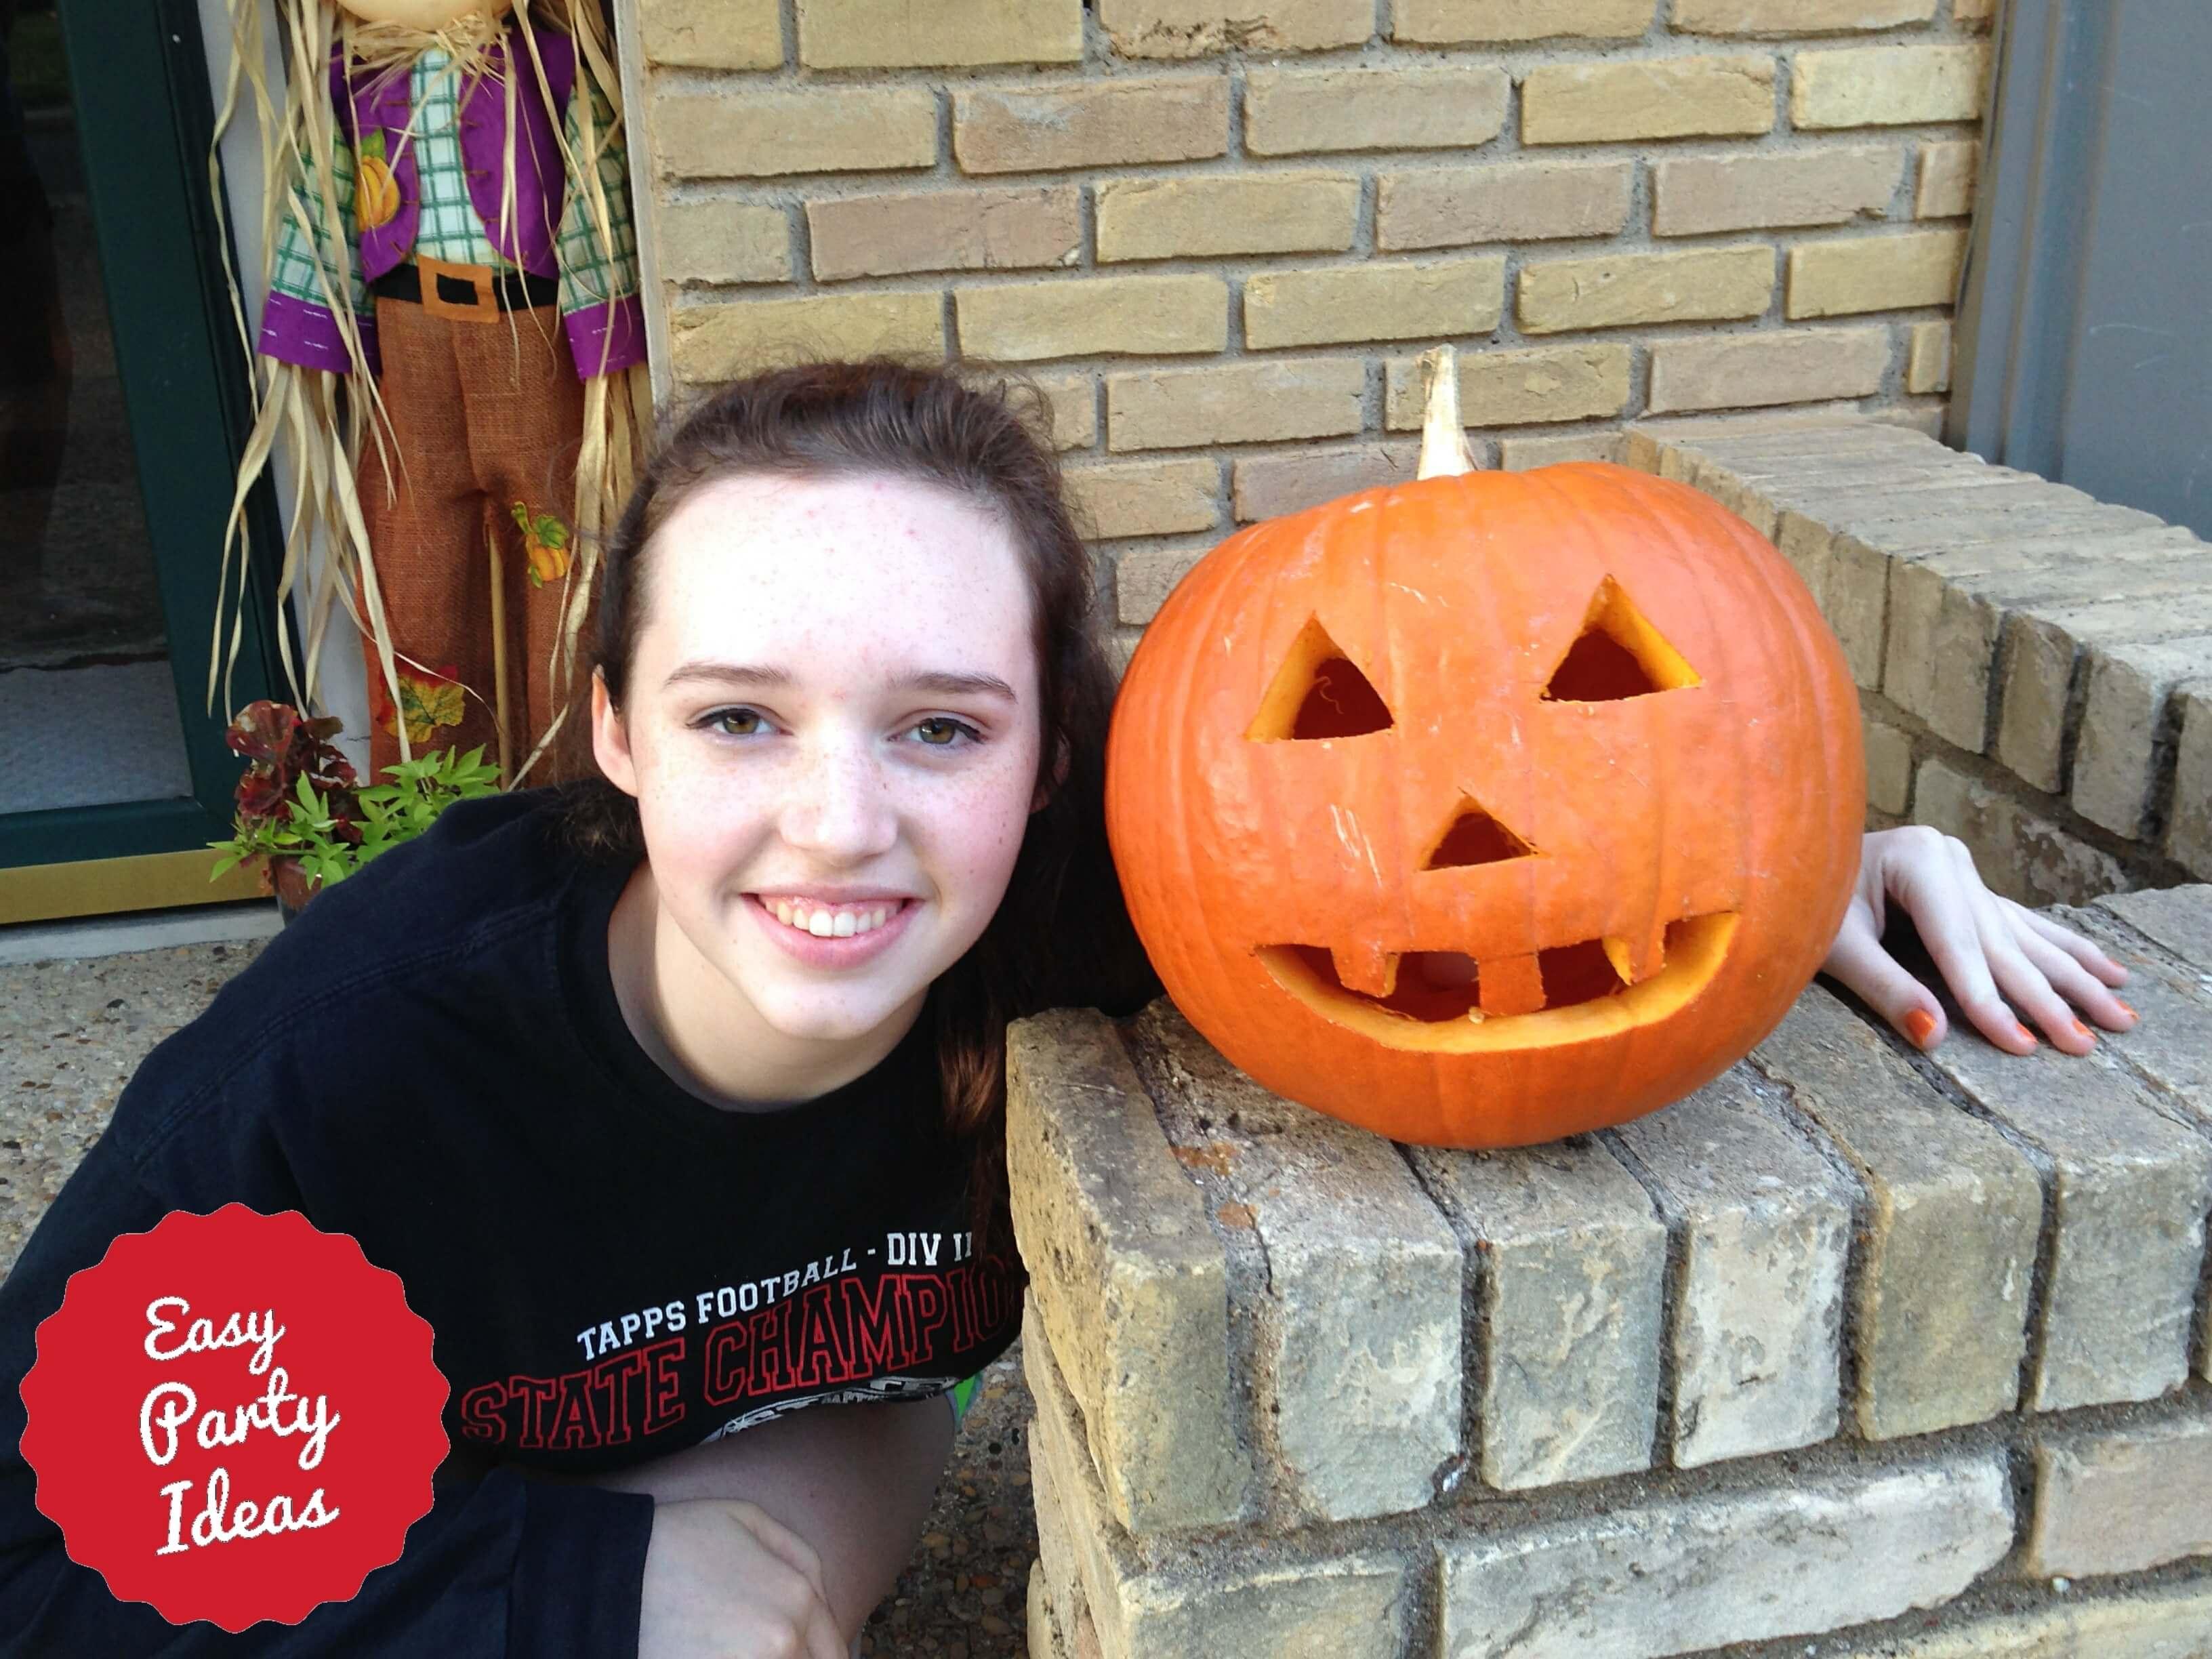 Teen with pumpkin